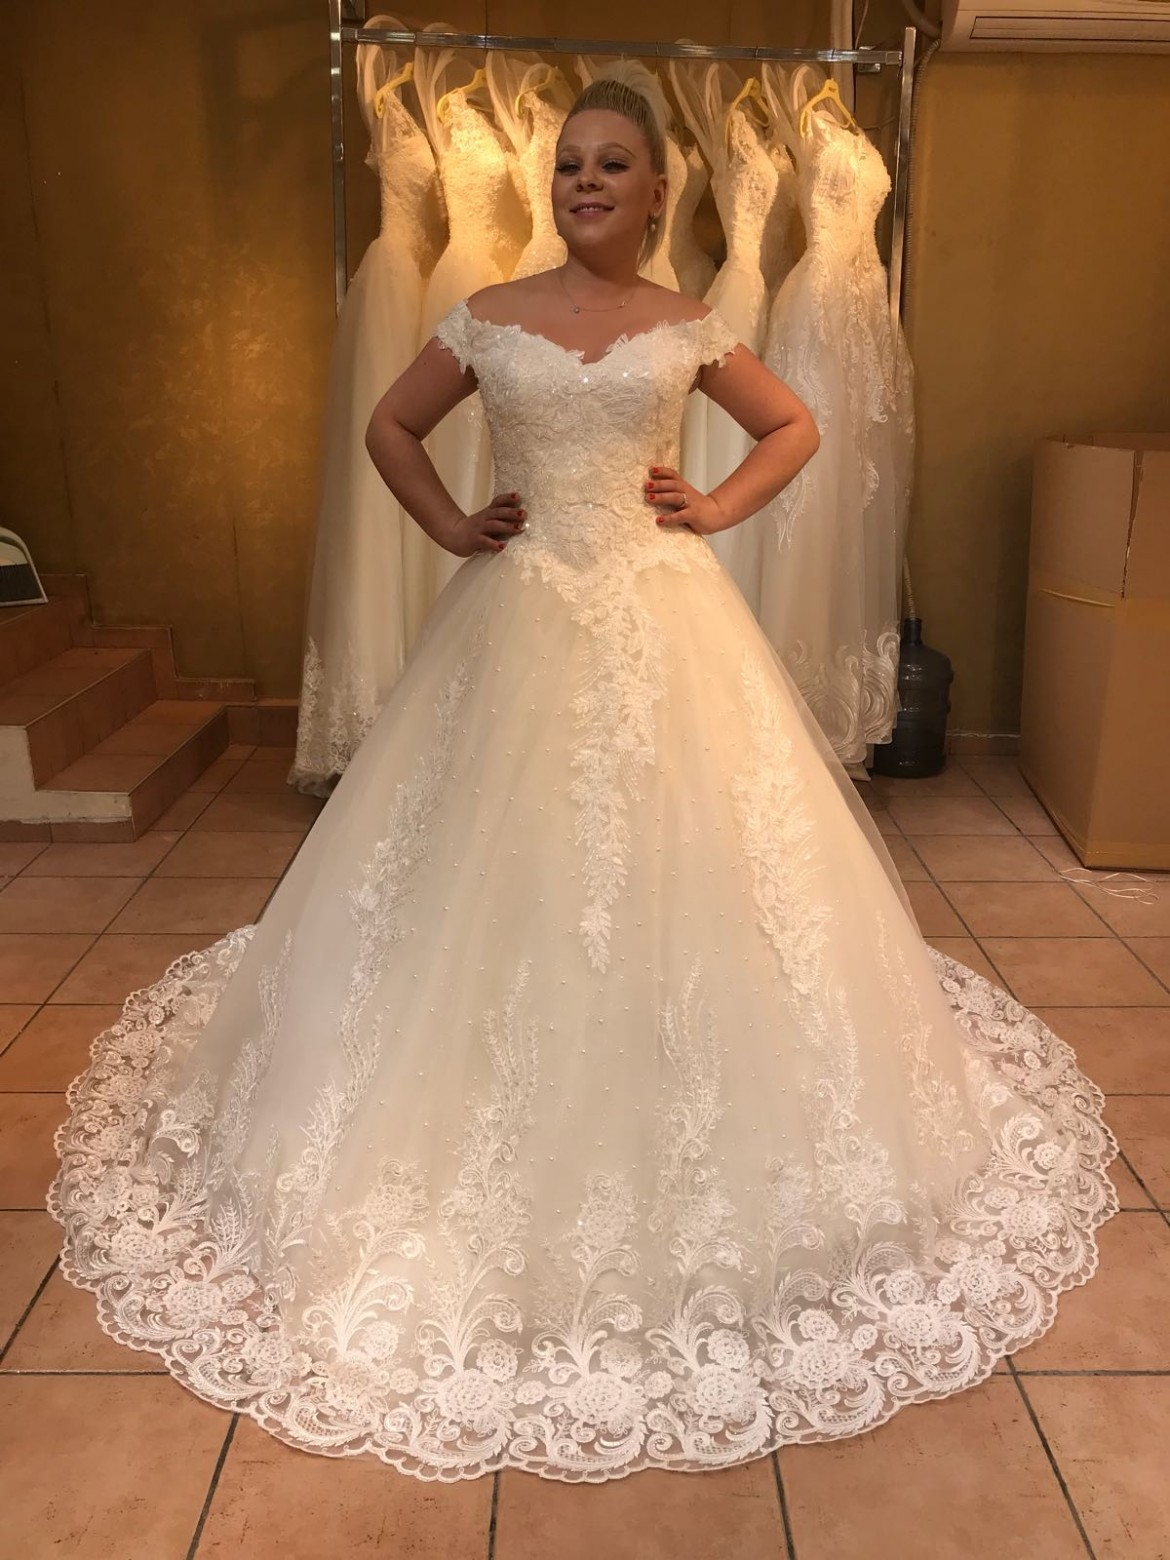 بالصور احدث فساتين الزفاف , موديلات فساتين زفاف جديده لعام 2019 3724 1